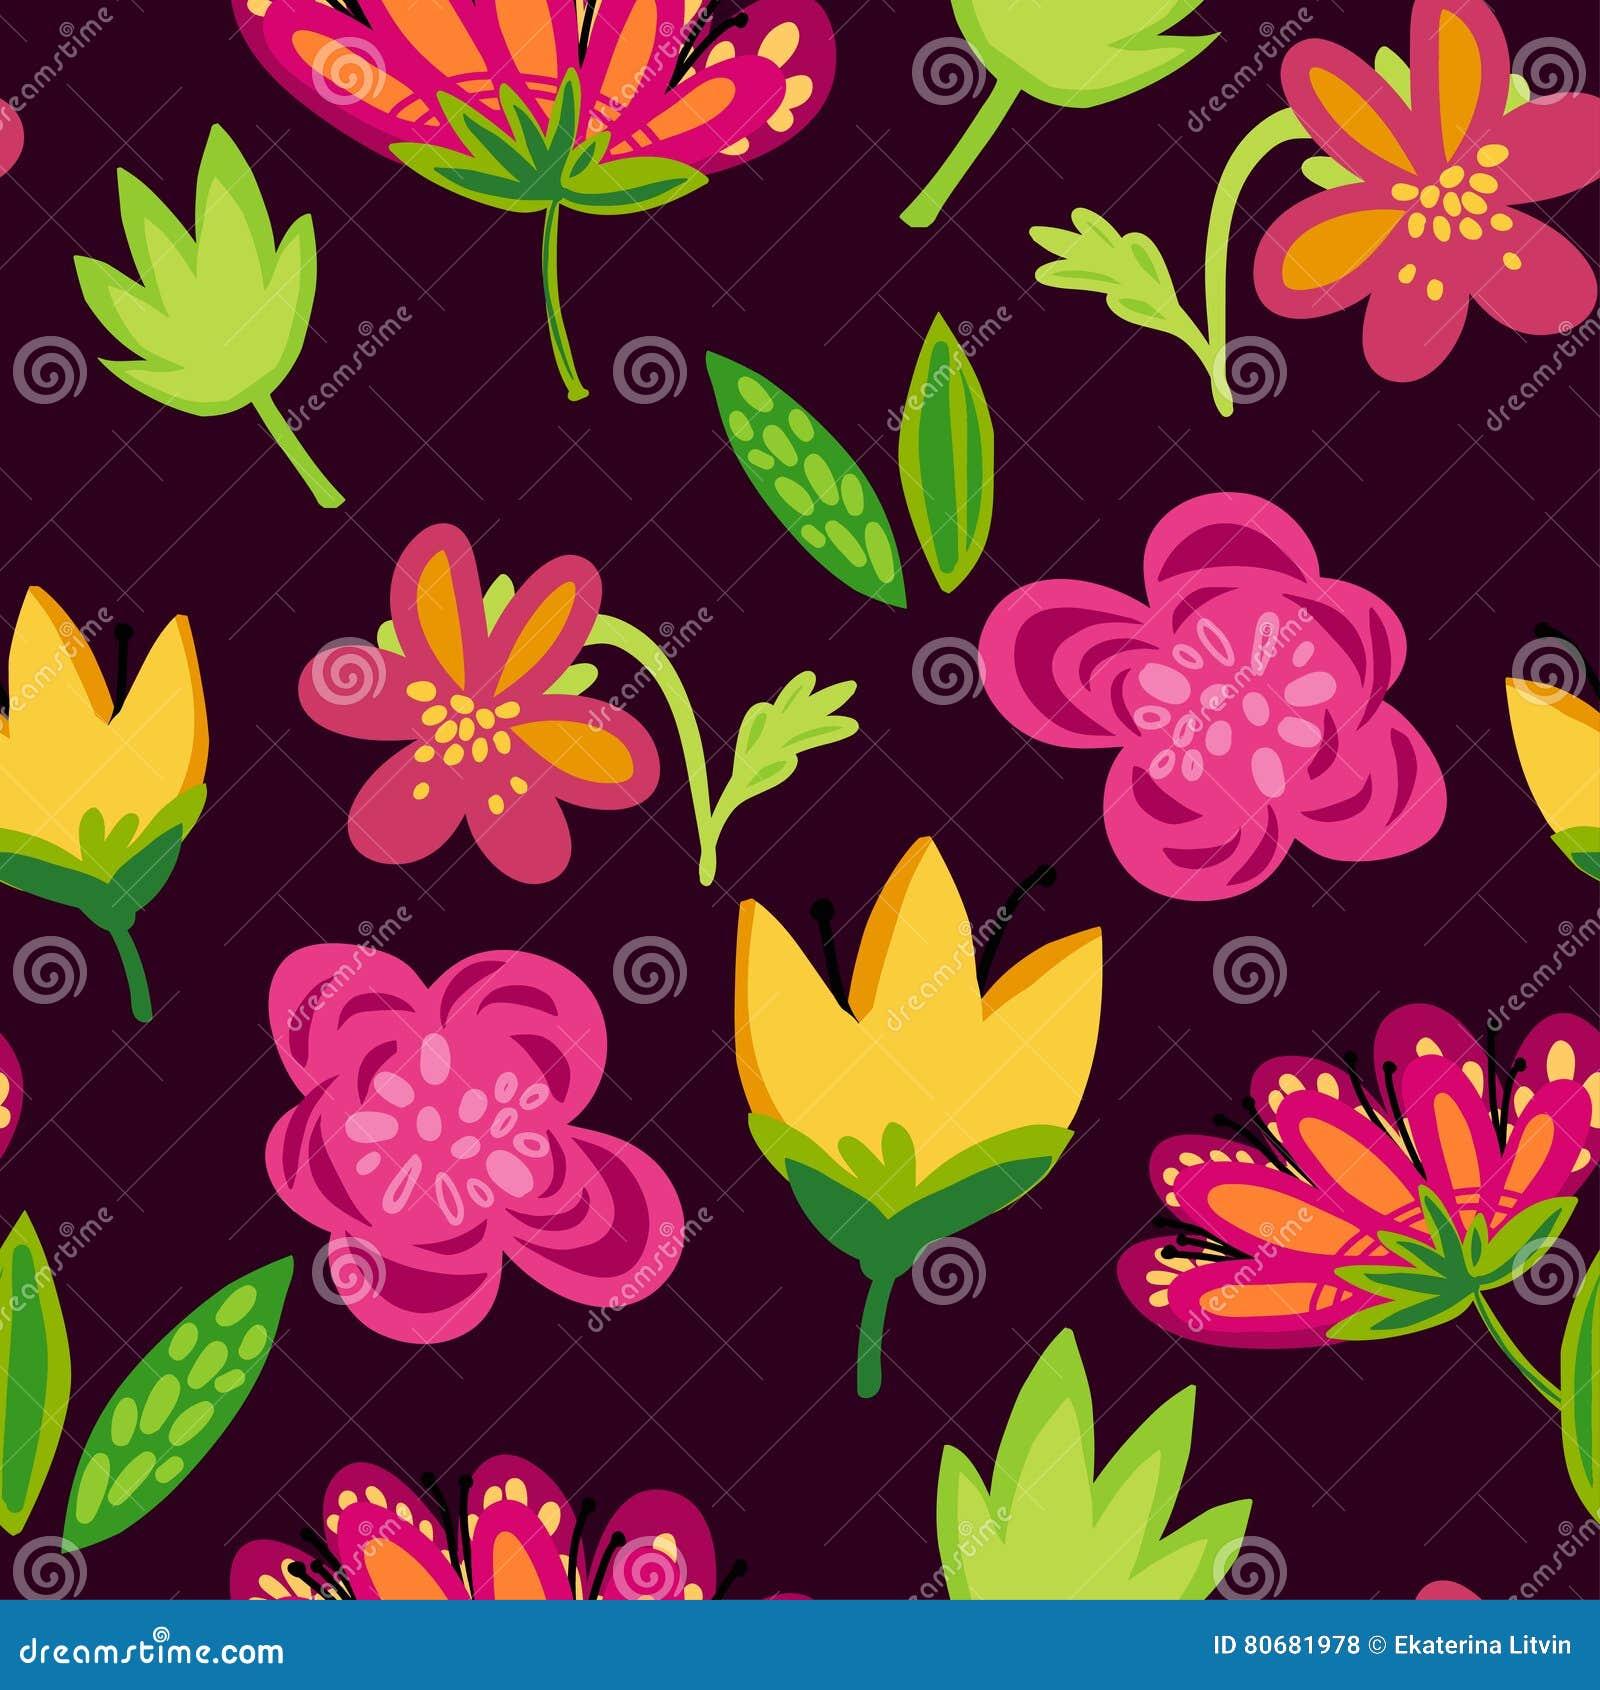 Bright Spring Flowers On Dark Background Stock Vector Illustration